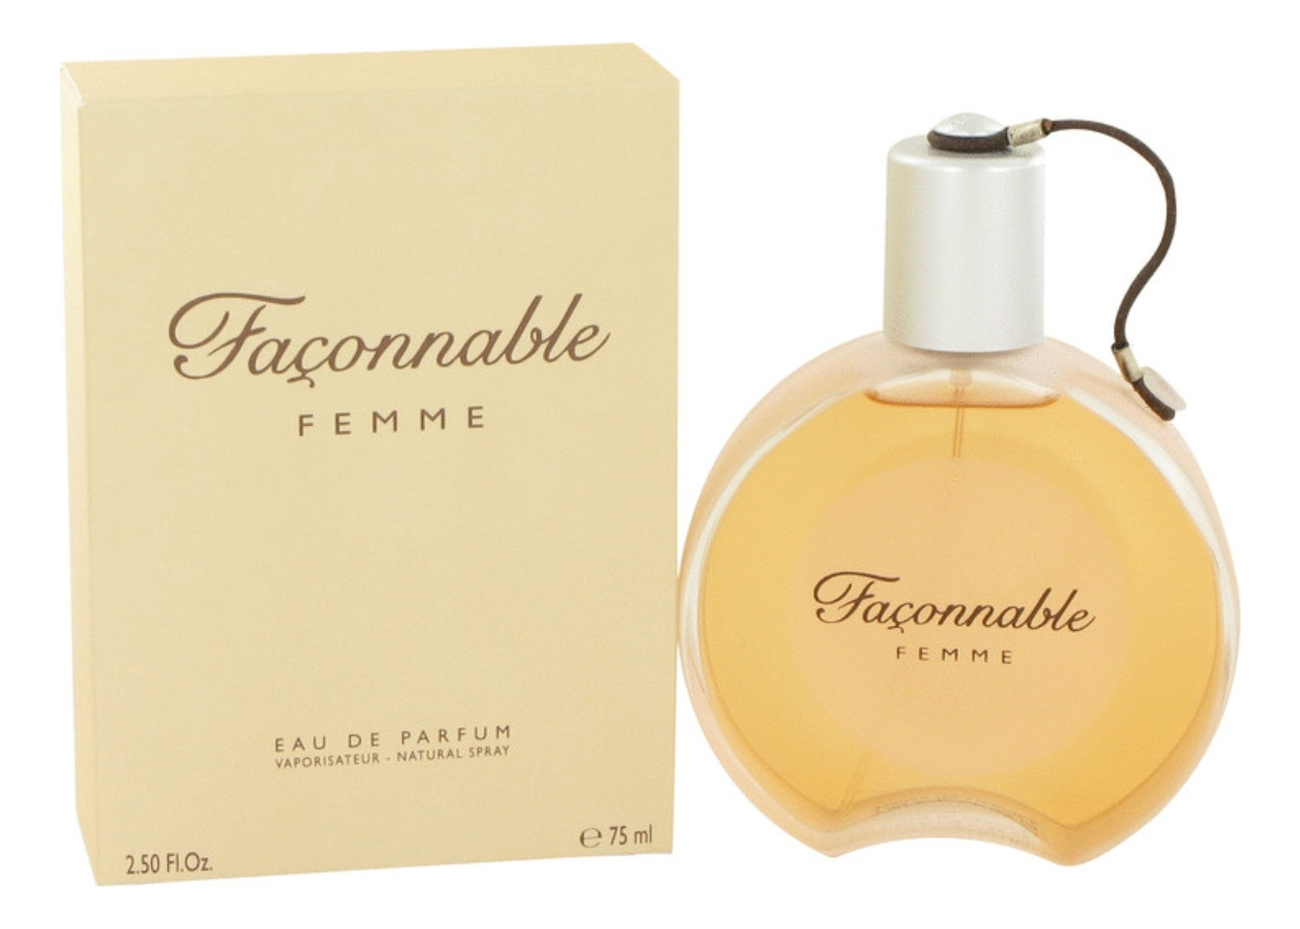 Купить Femme: парфюмерная вода 75мл, Faconnable